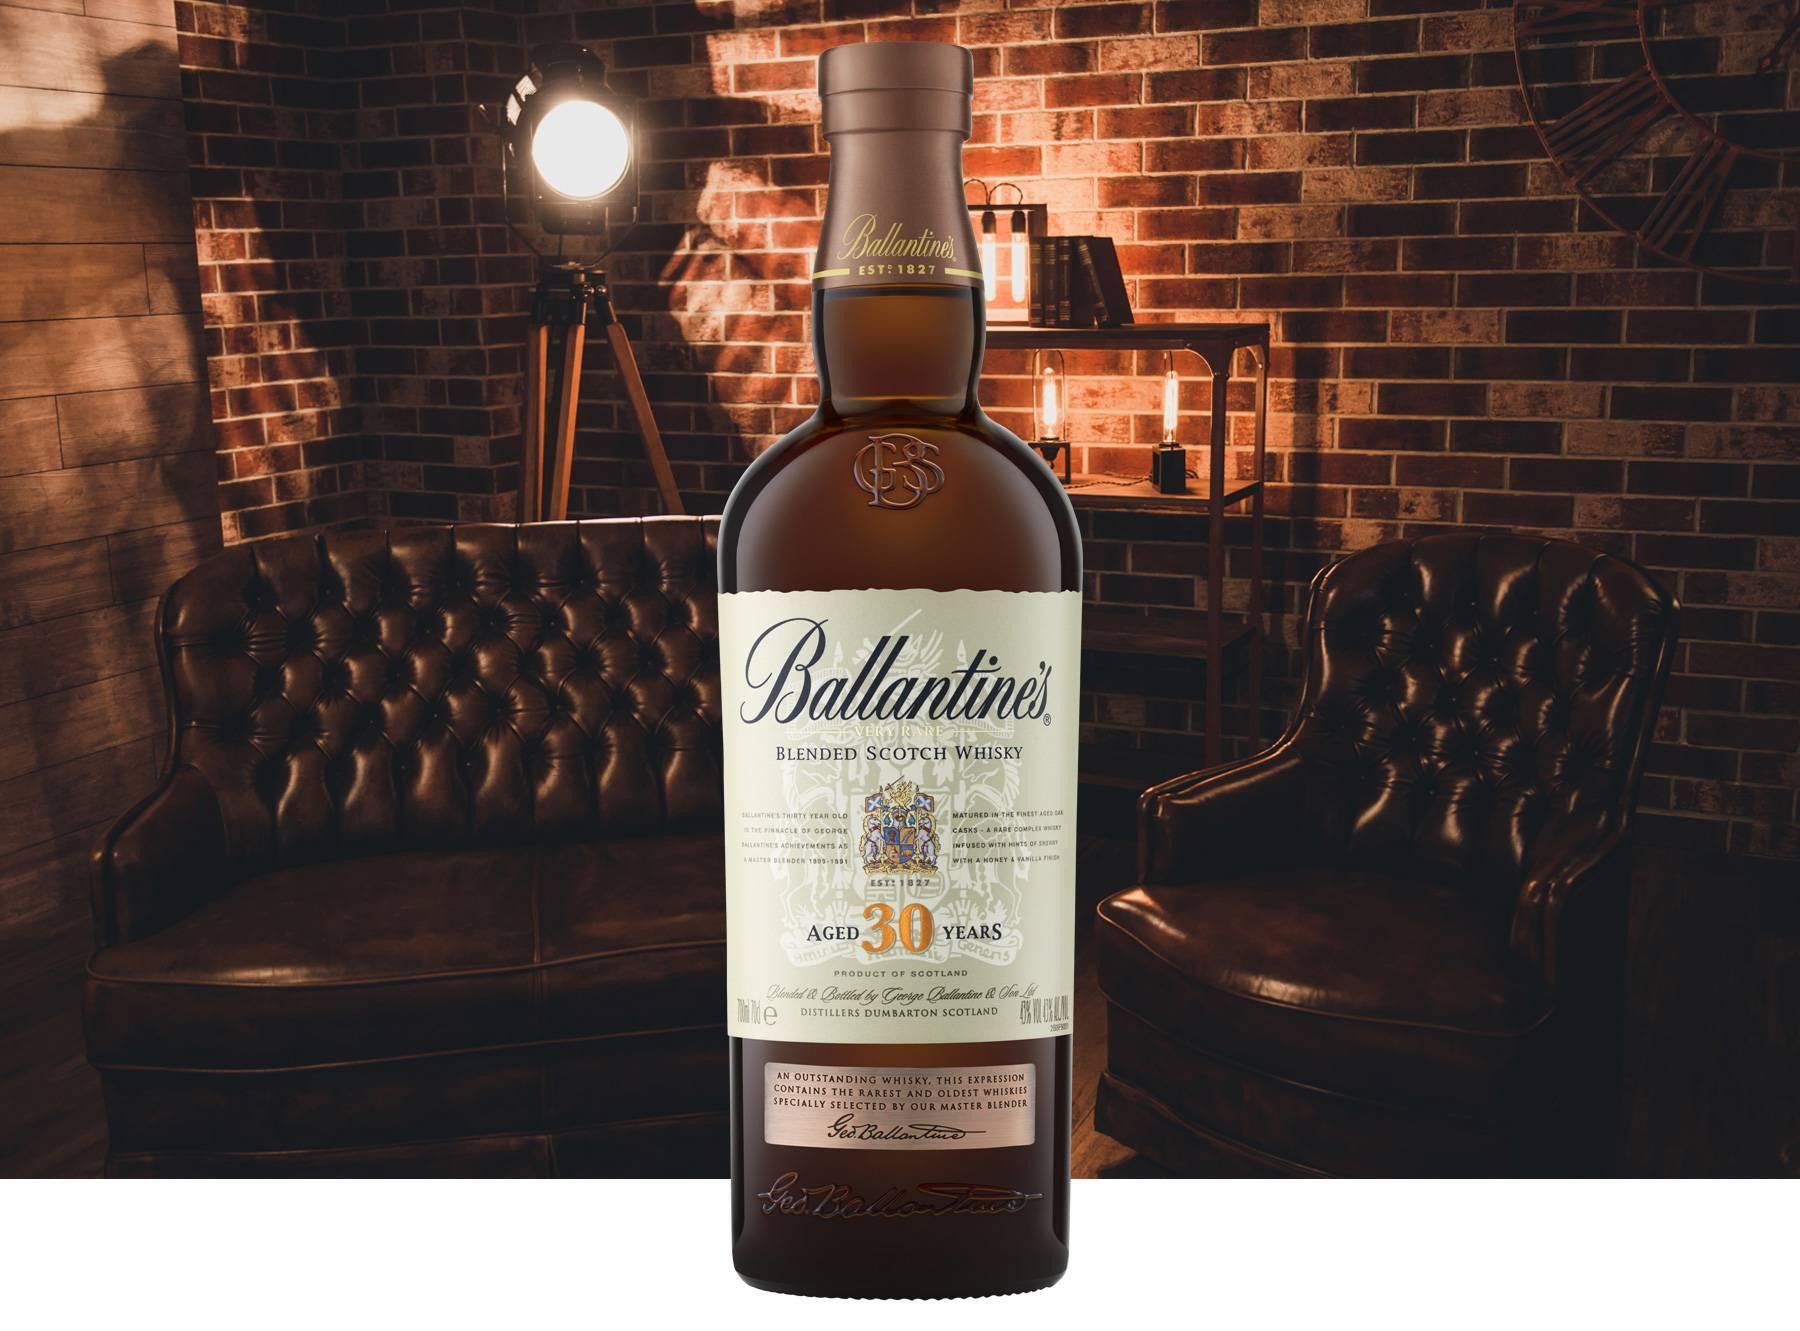 Виски ballantine's - как отличить подделку